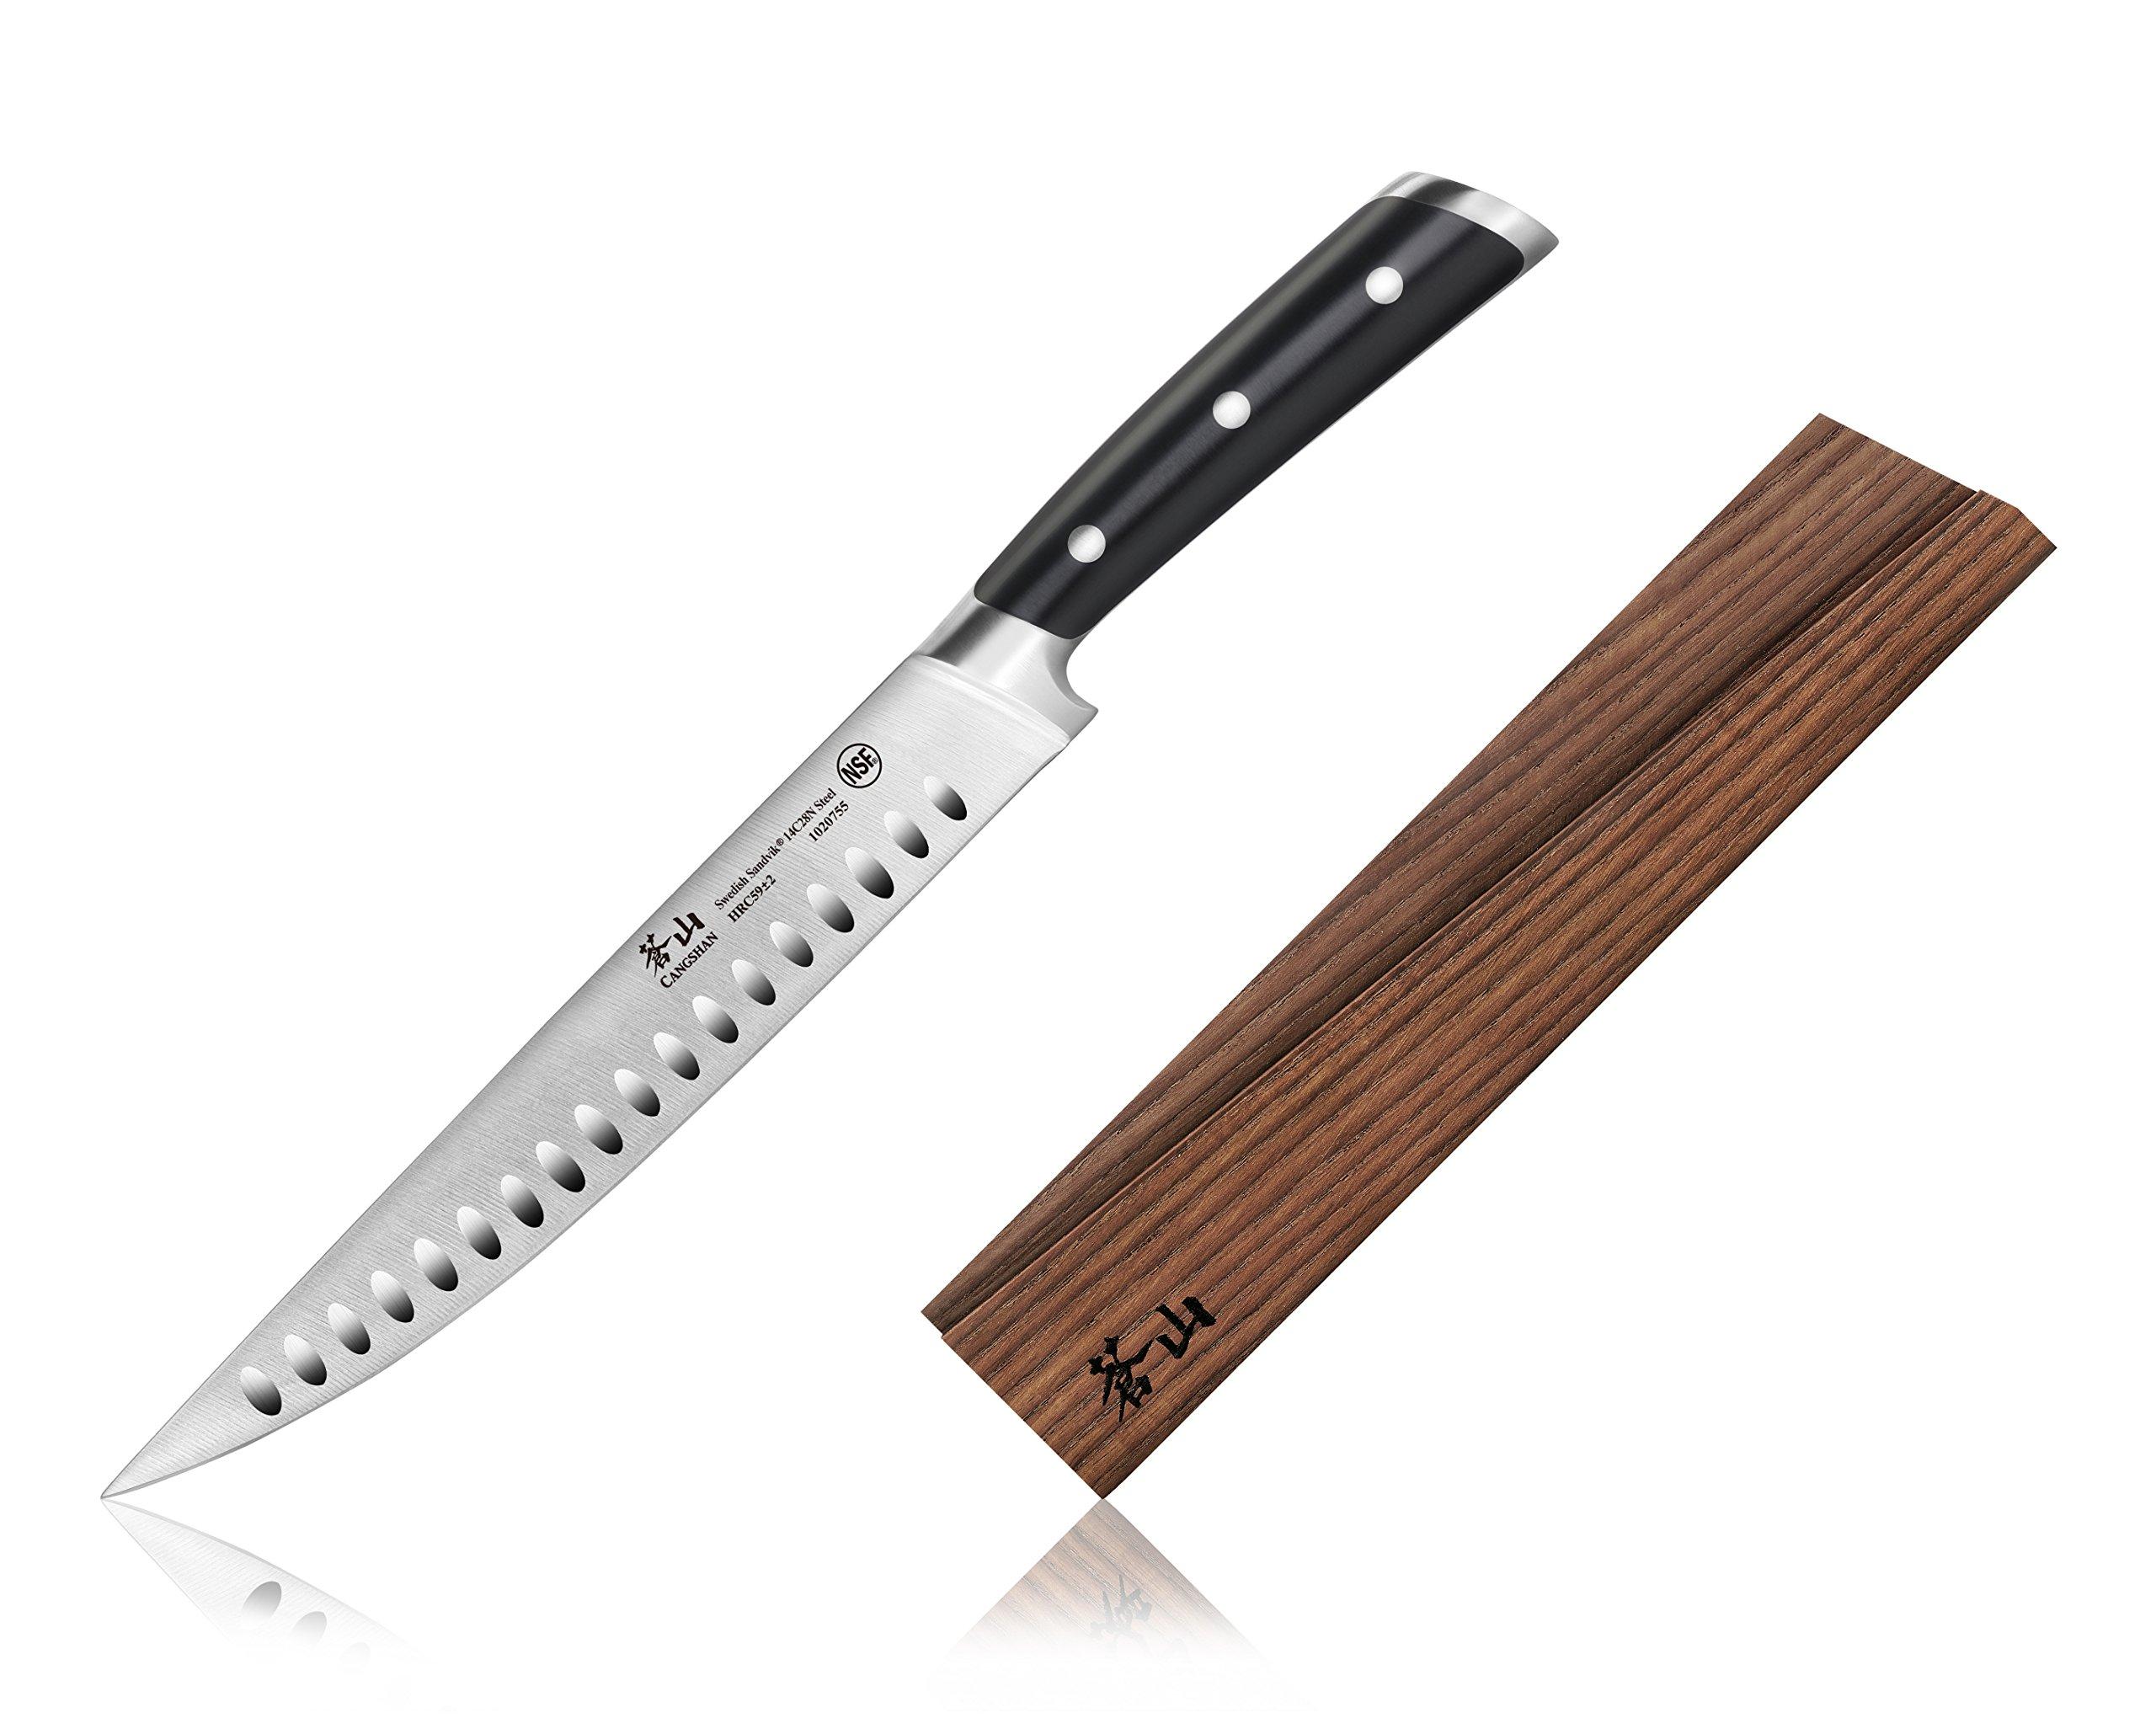 Cangshan TS Series 1020762 Swedish Sandvik 14C28N Swedish Steel Forged 9-Inch Carving Knife And Wood Sheath Set